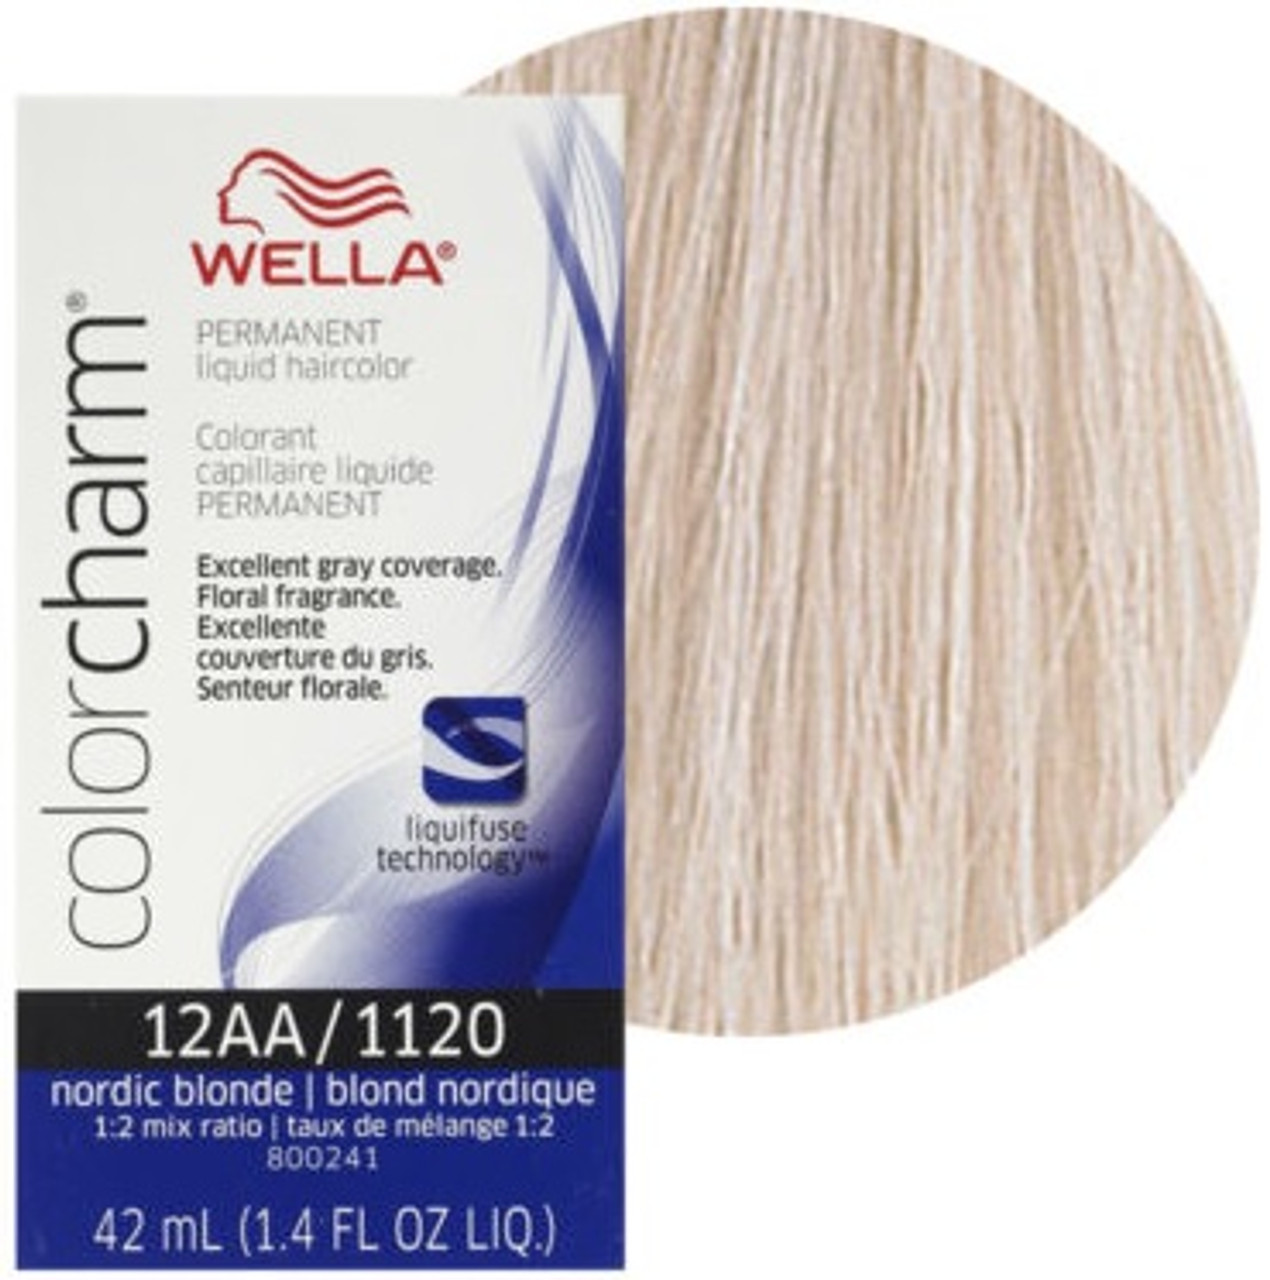 Wella Color Charm Color 1120 - Nordic Blonde 1.4 oz